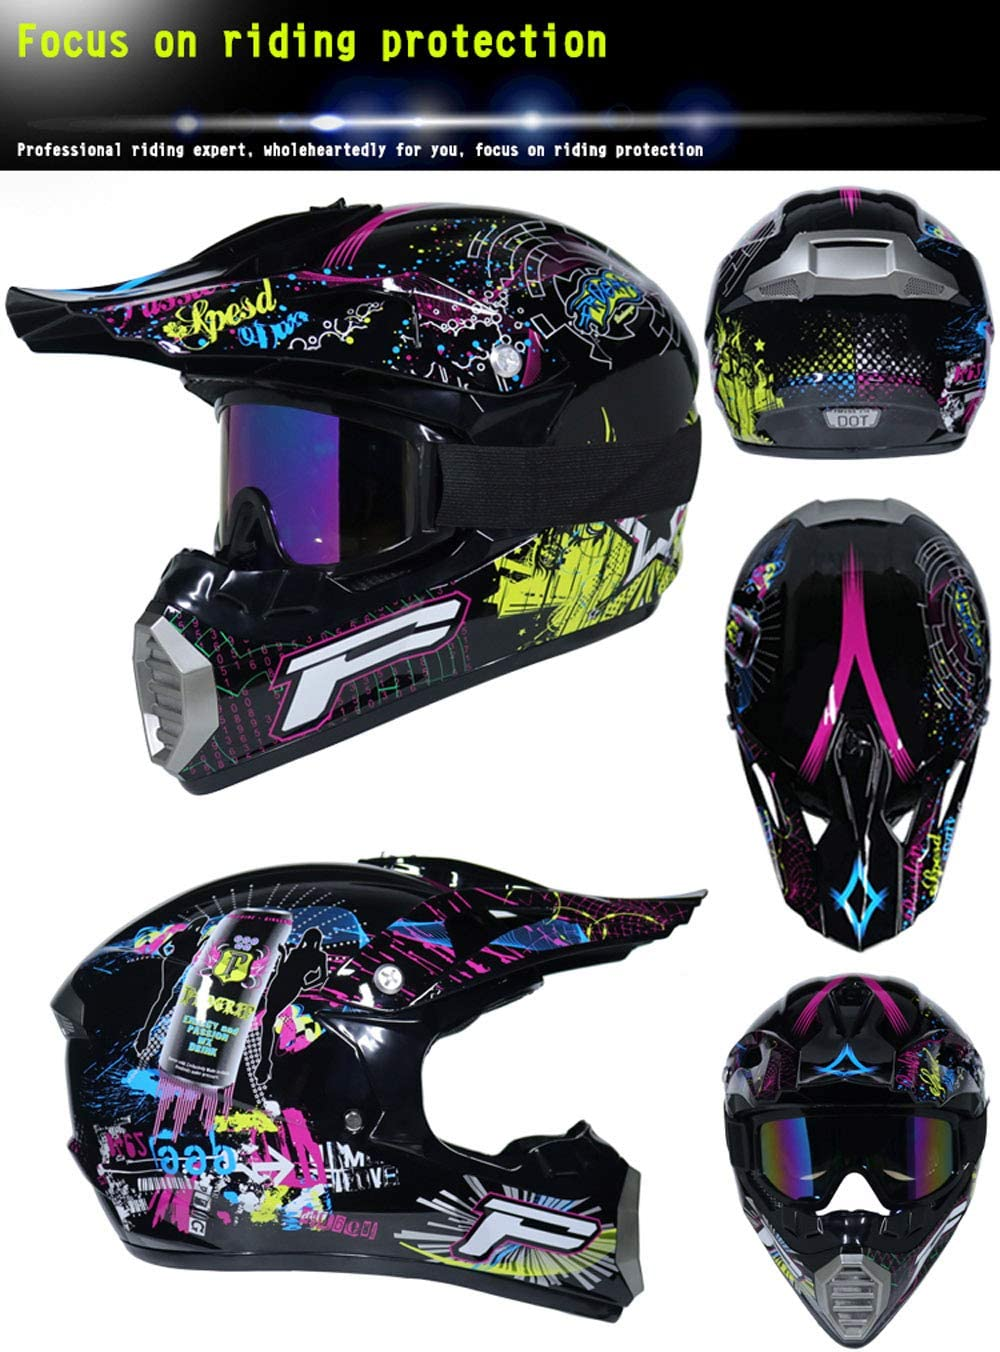 AB-04 Guantes Y Gafas D.O.T est/ándar Ni/ños Quad Bike ATV Go Karting Casco, S,M,L,XL Anderseb Motocicleta Motocross Cascos